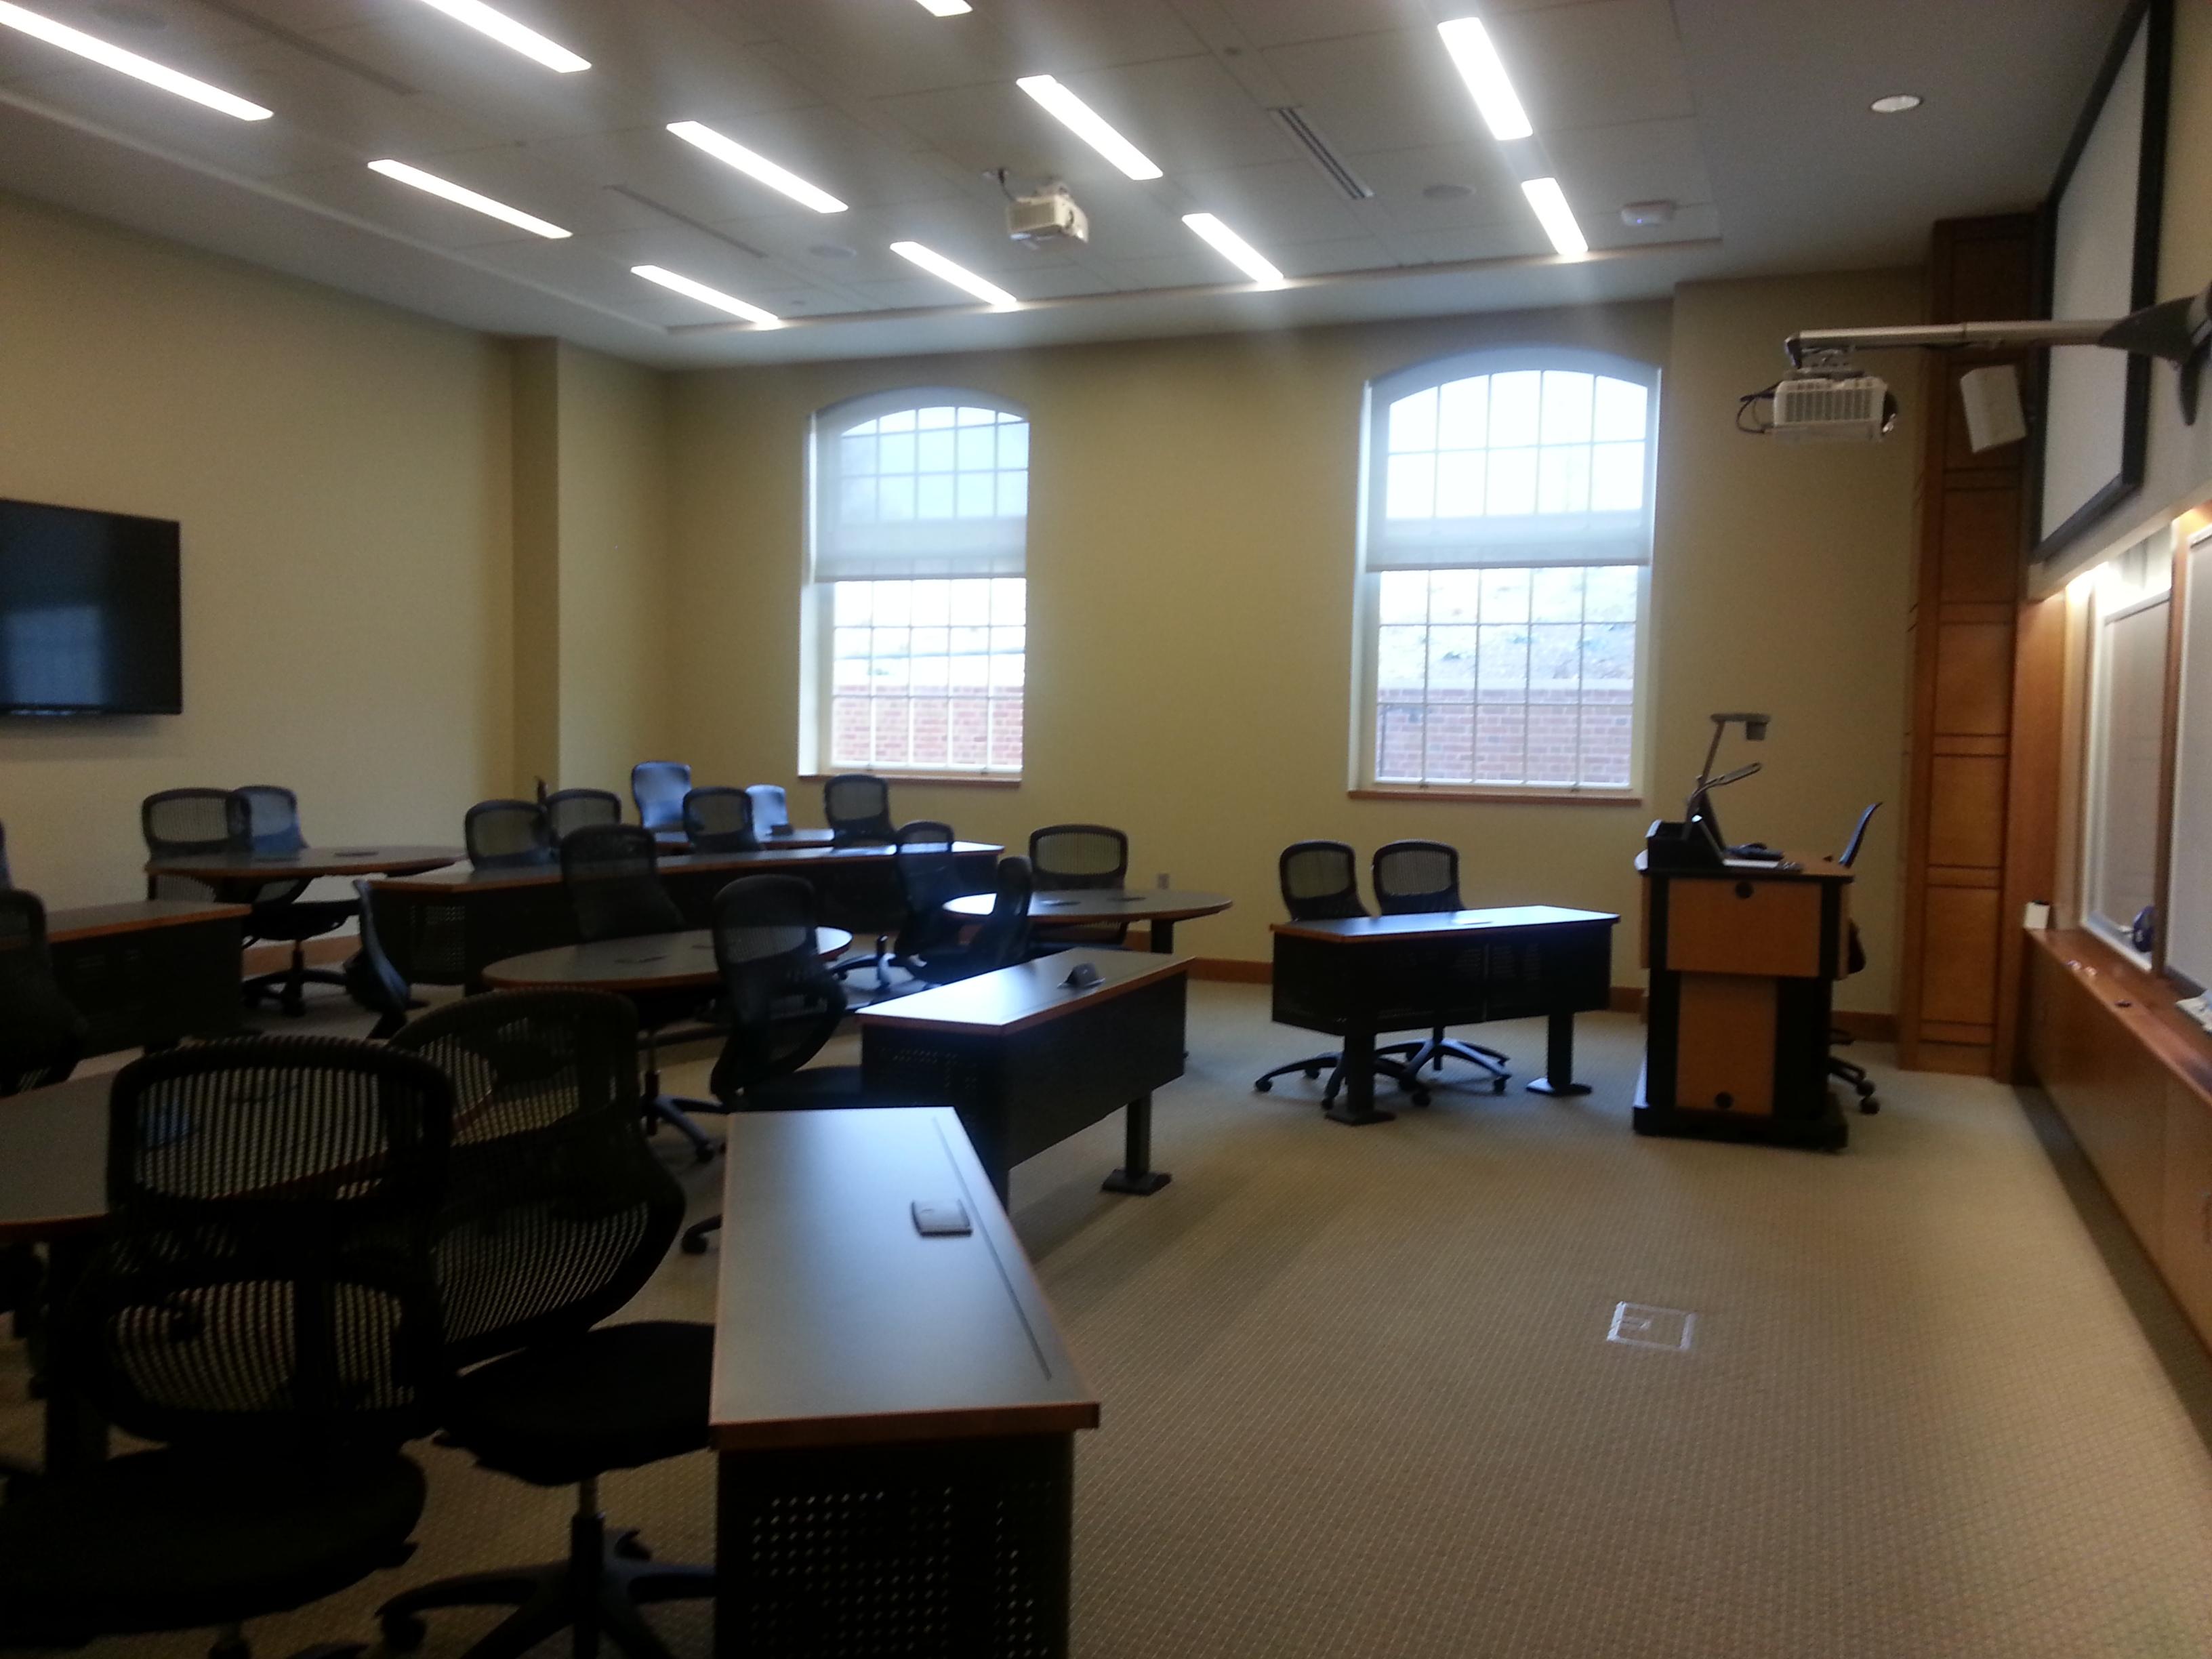 Farrell Classroom